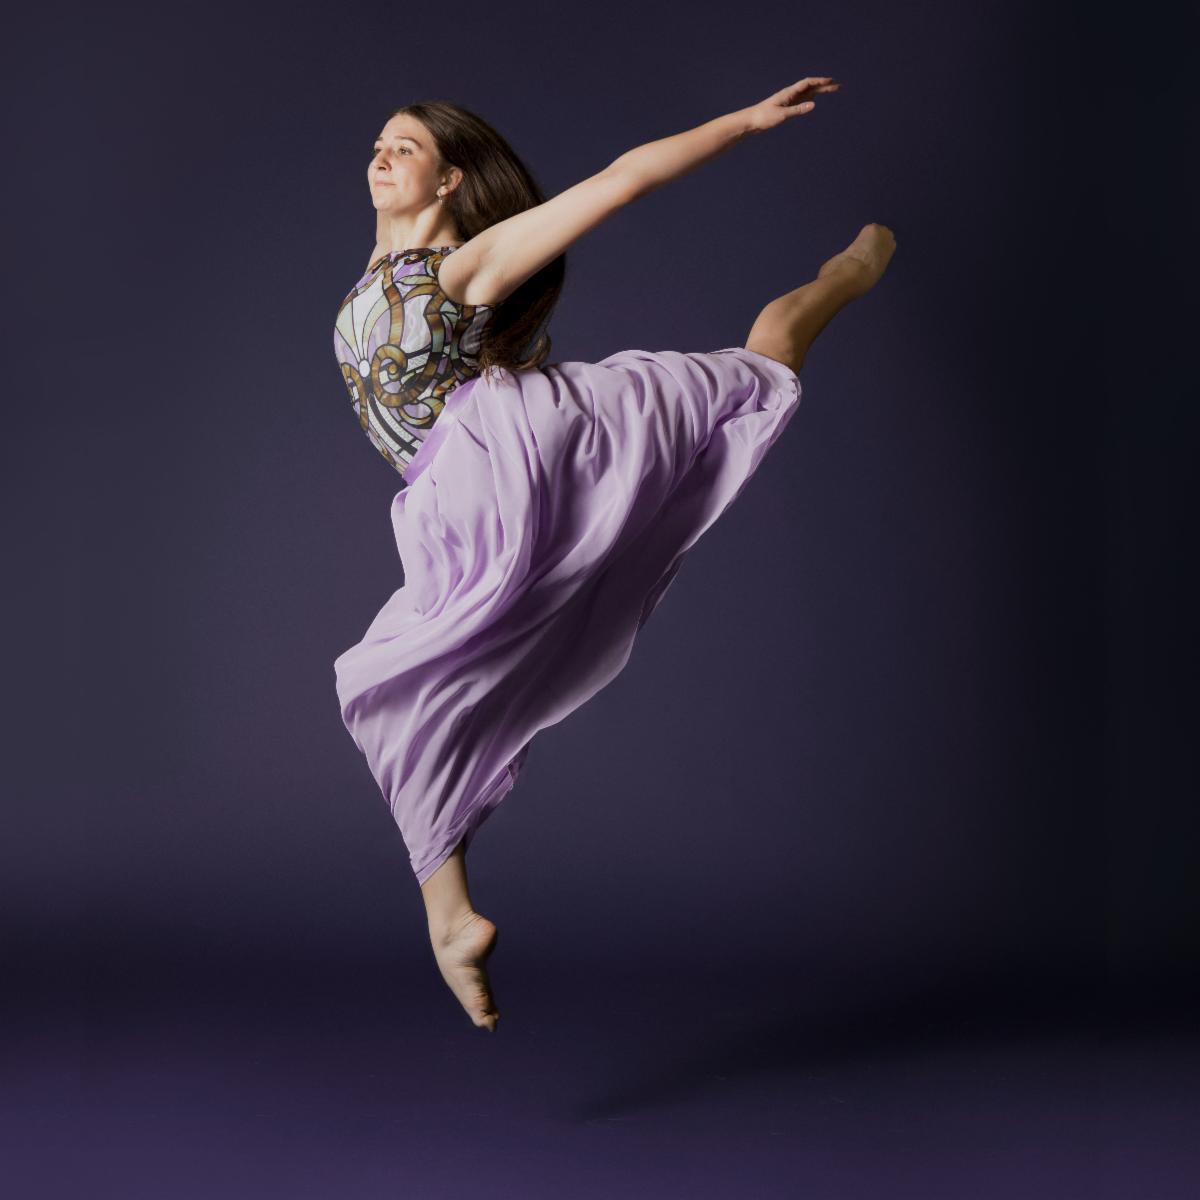 GraceV1-insta-purpleweb.jpg